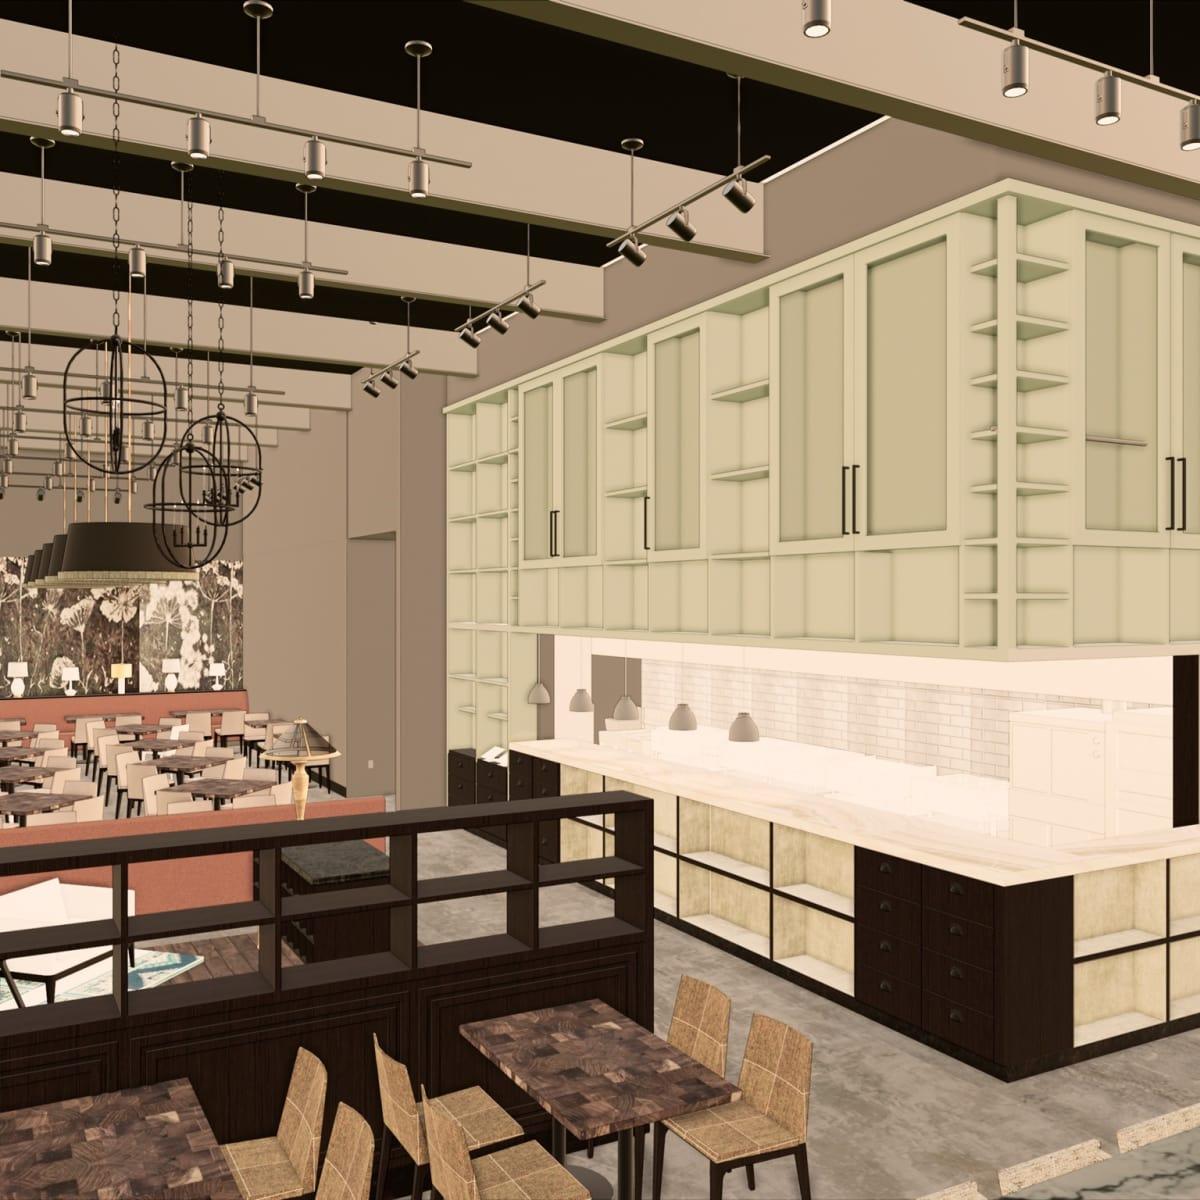 Jonathan's the Rub Memorial Green interior rendering